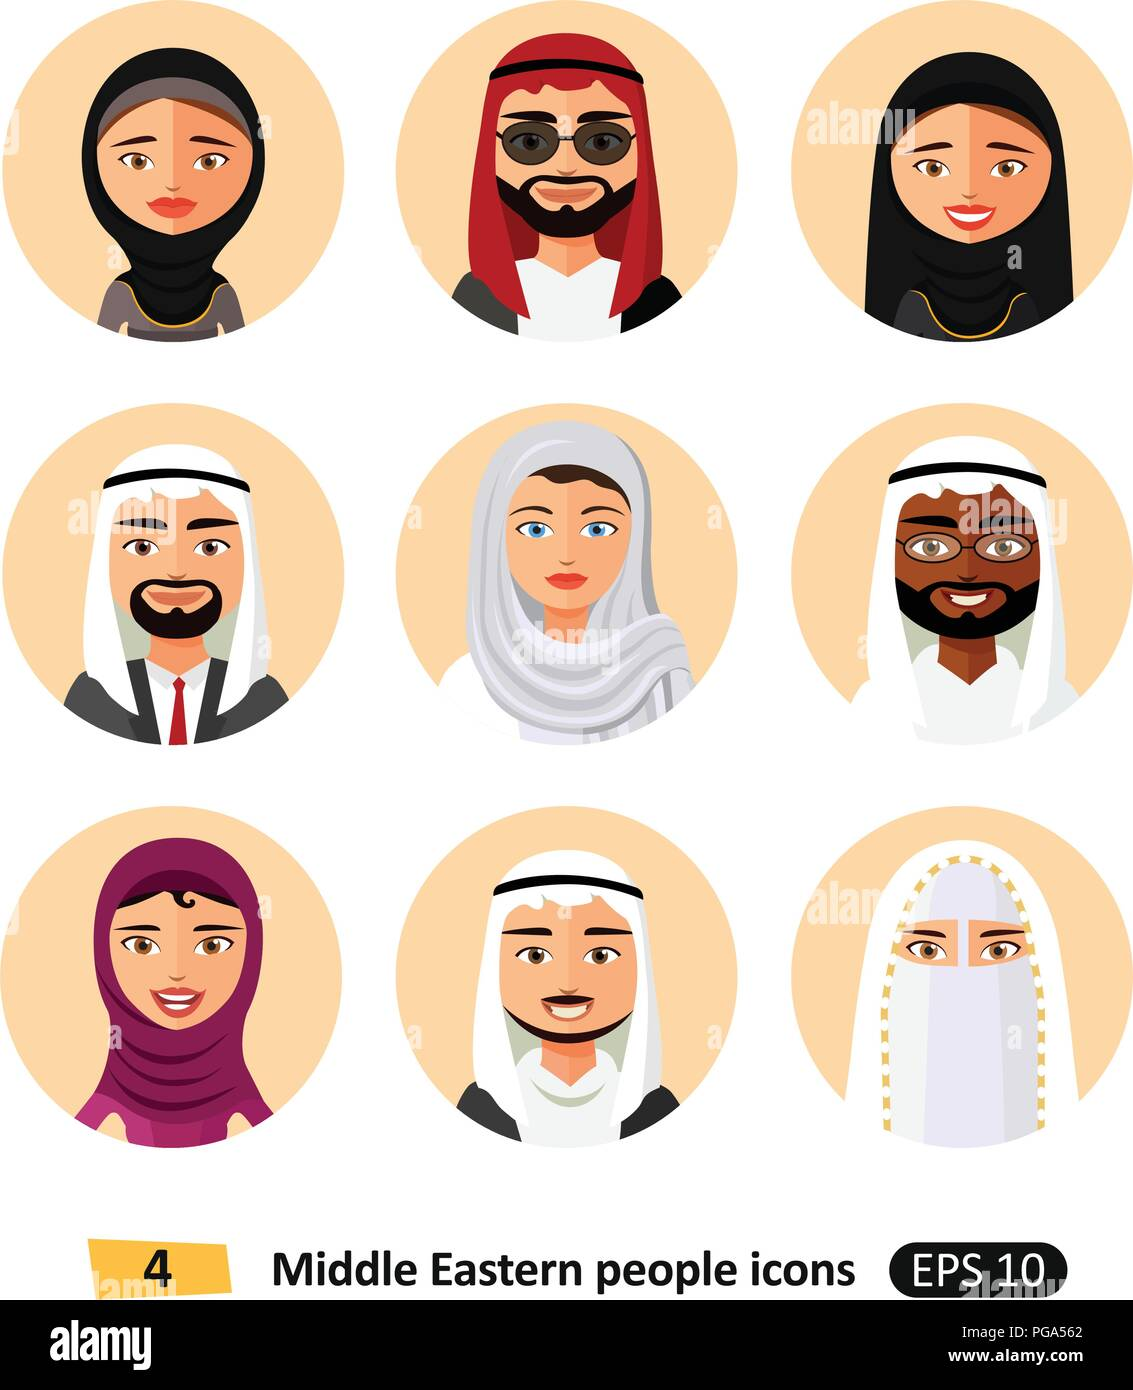 Vector Middle Eastern Arab People Avatars Flat Icons Symbol Stock